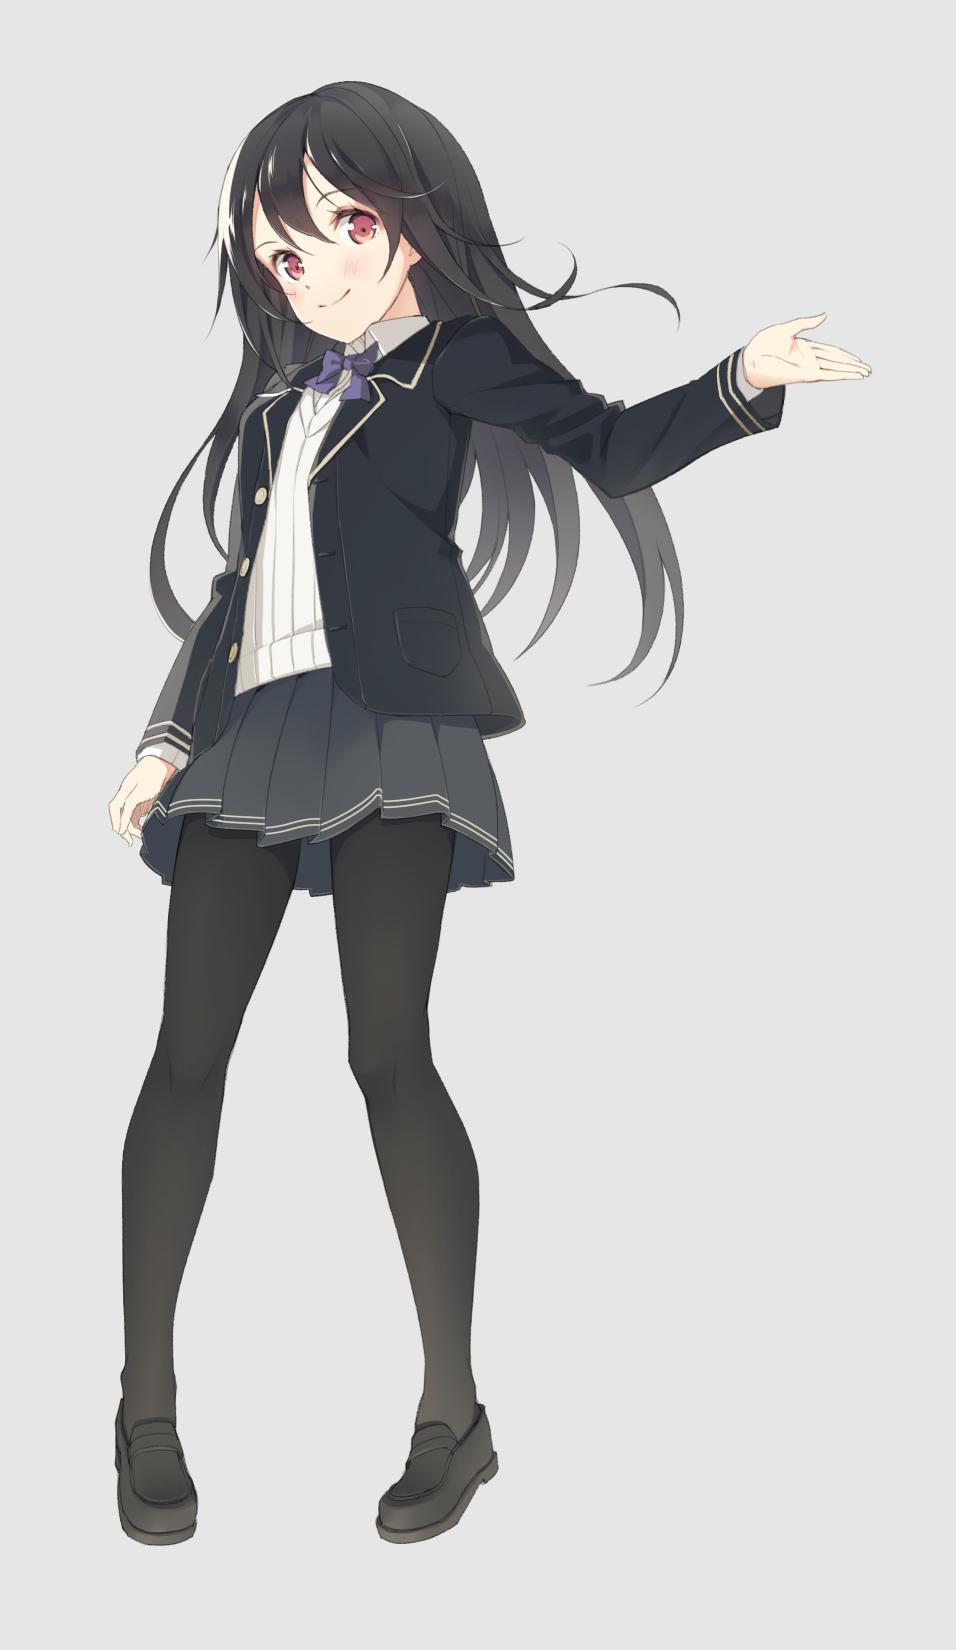 Anime Girl Black Hair Black Wallpaper Yoshino Ryou Mobile Wallpaper 1852377 Zerochan Anime